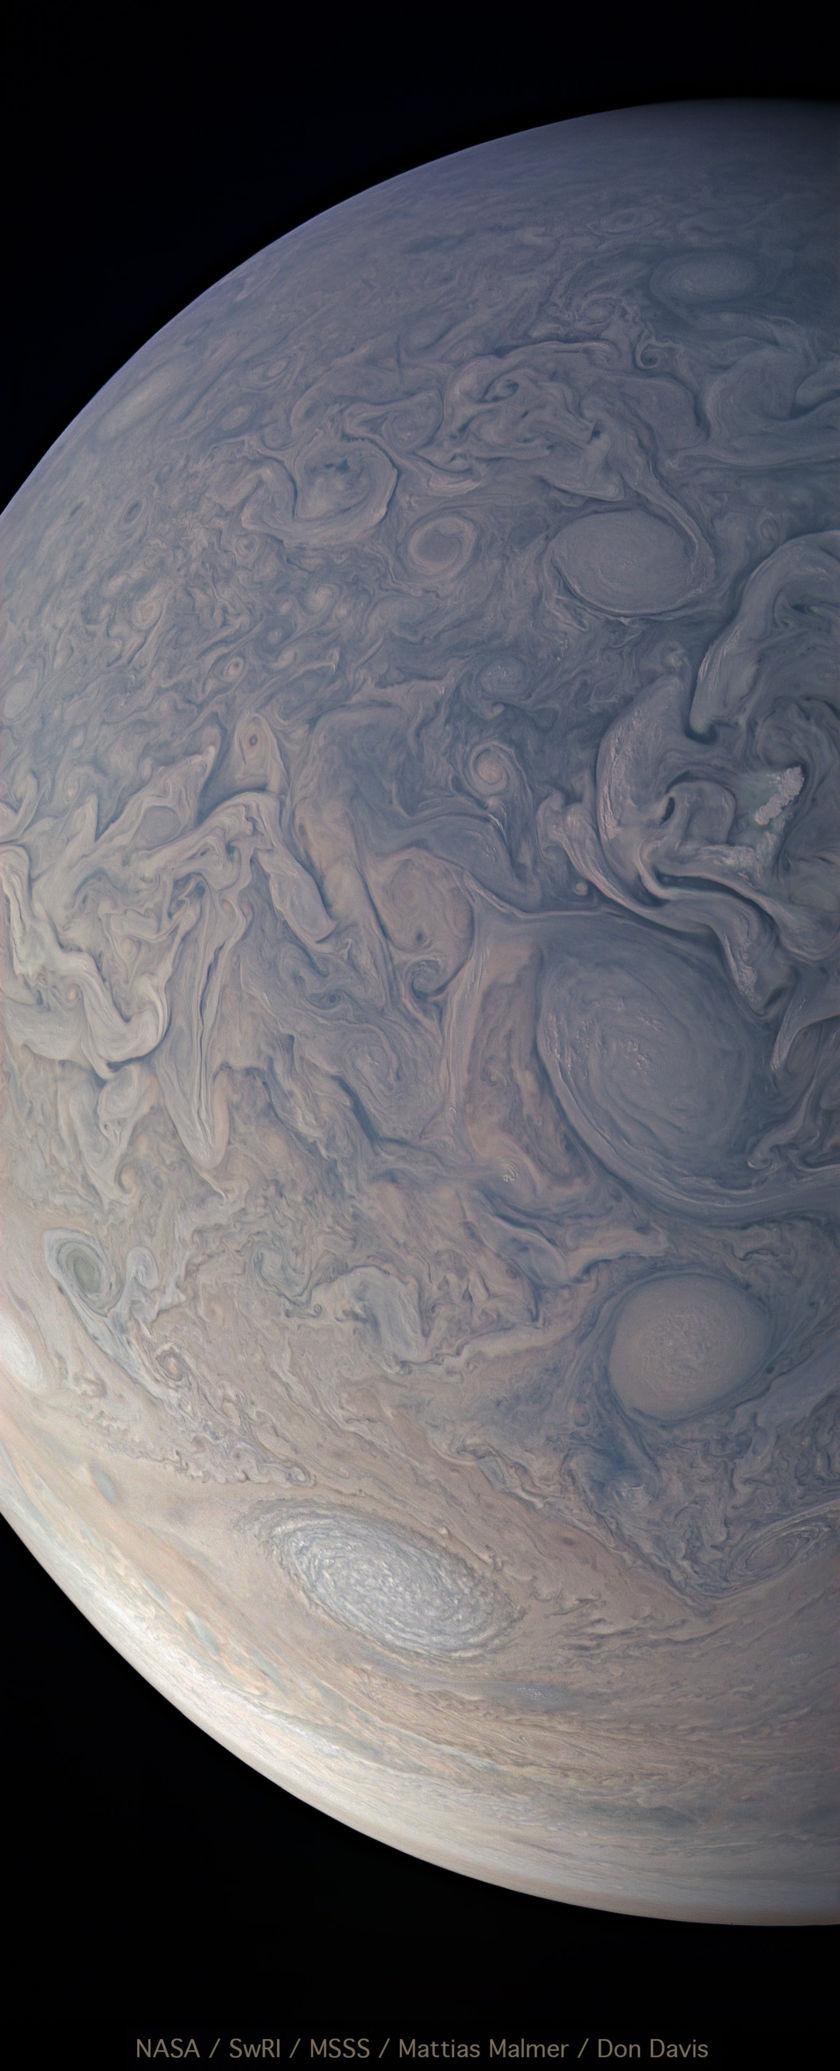 Jupiter's northern turbulent region